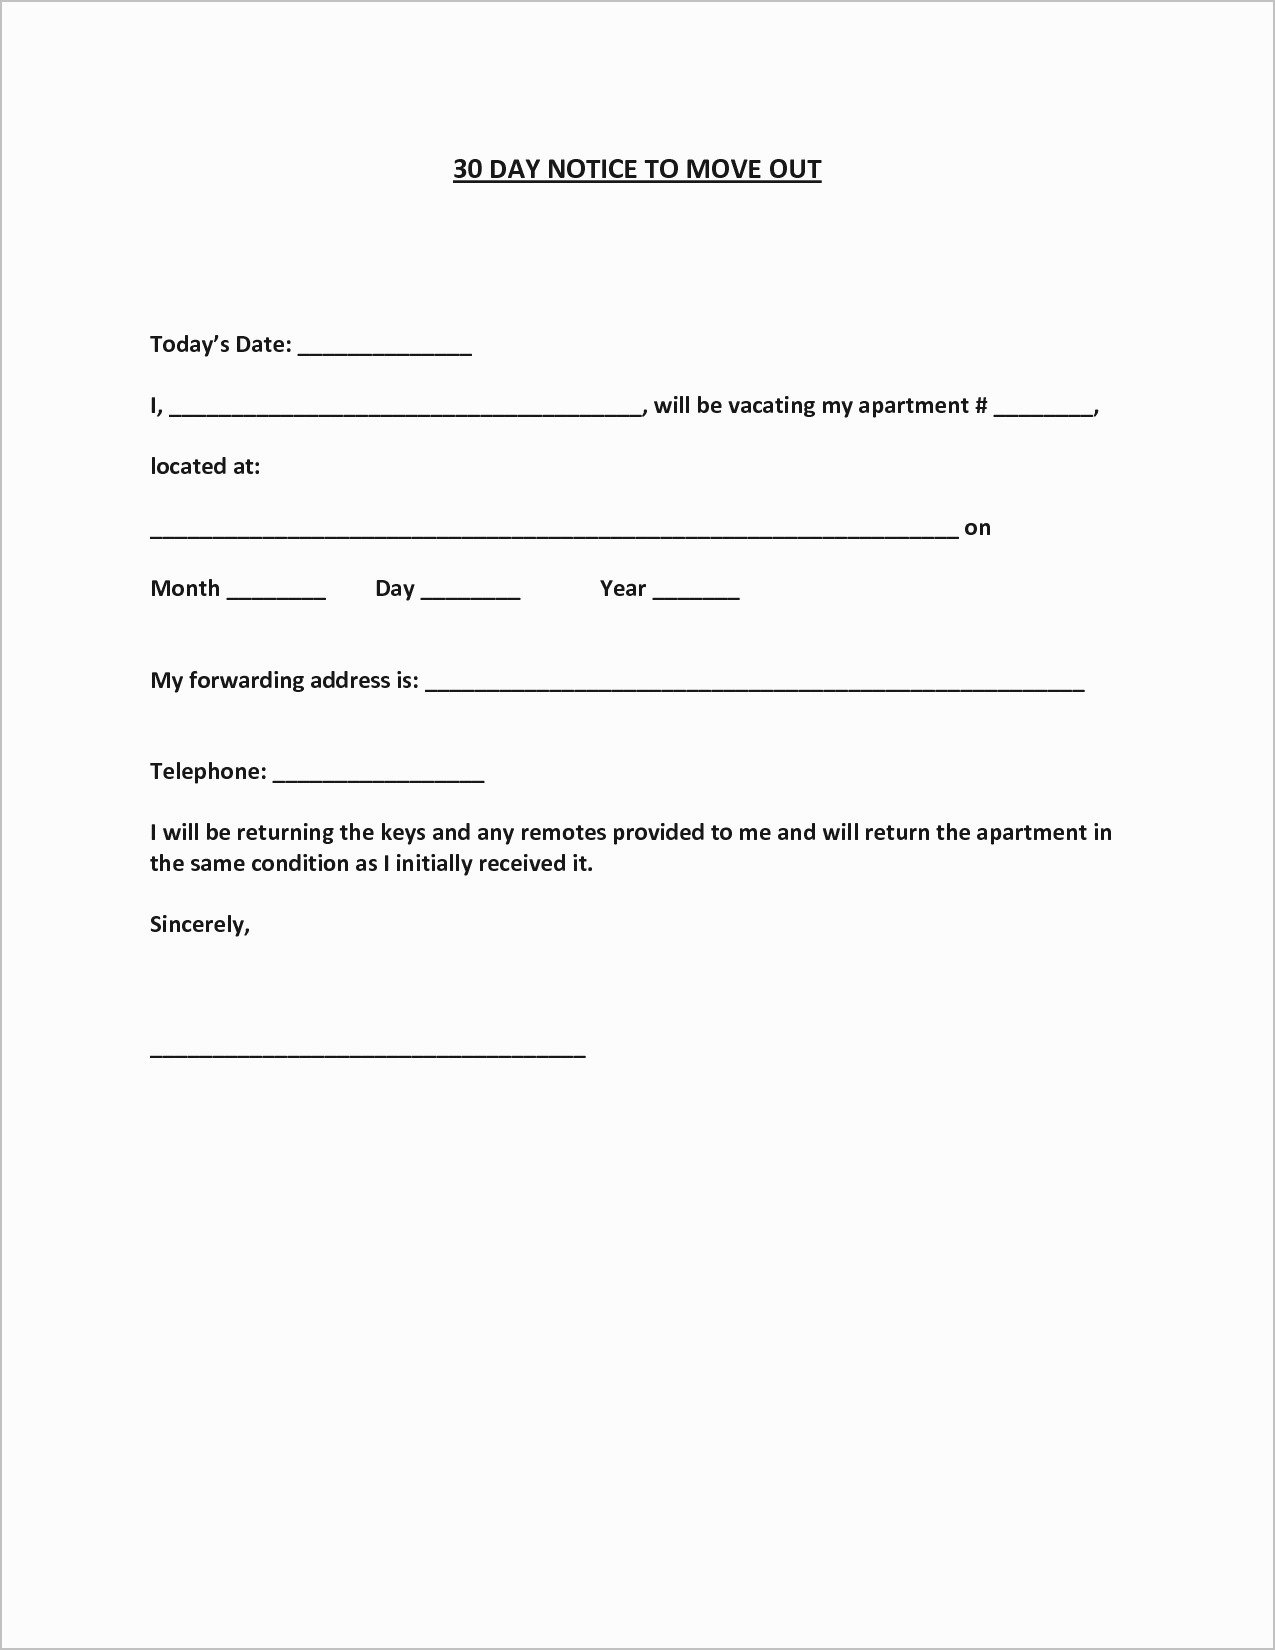 Printable Notarized Letter Of Residency Template Awesome Notarized Letter Template for Residency Samples